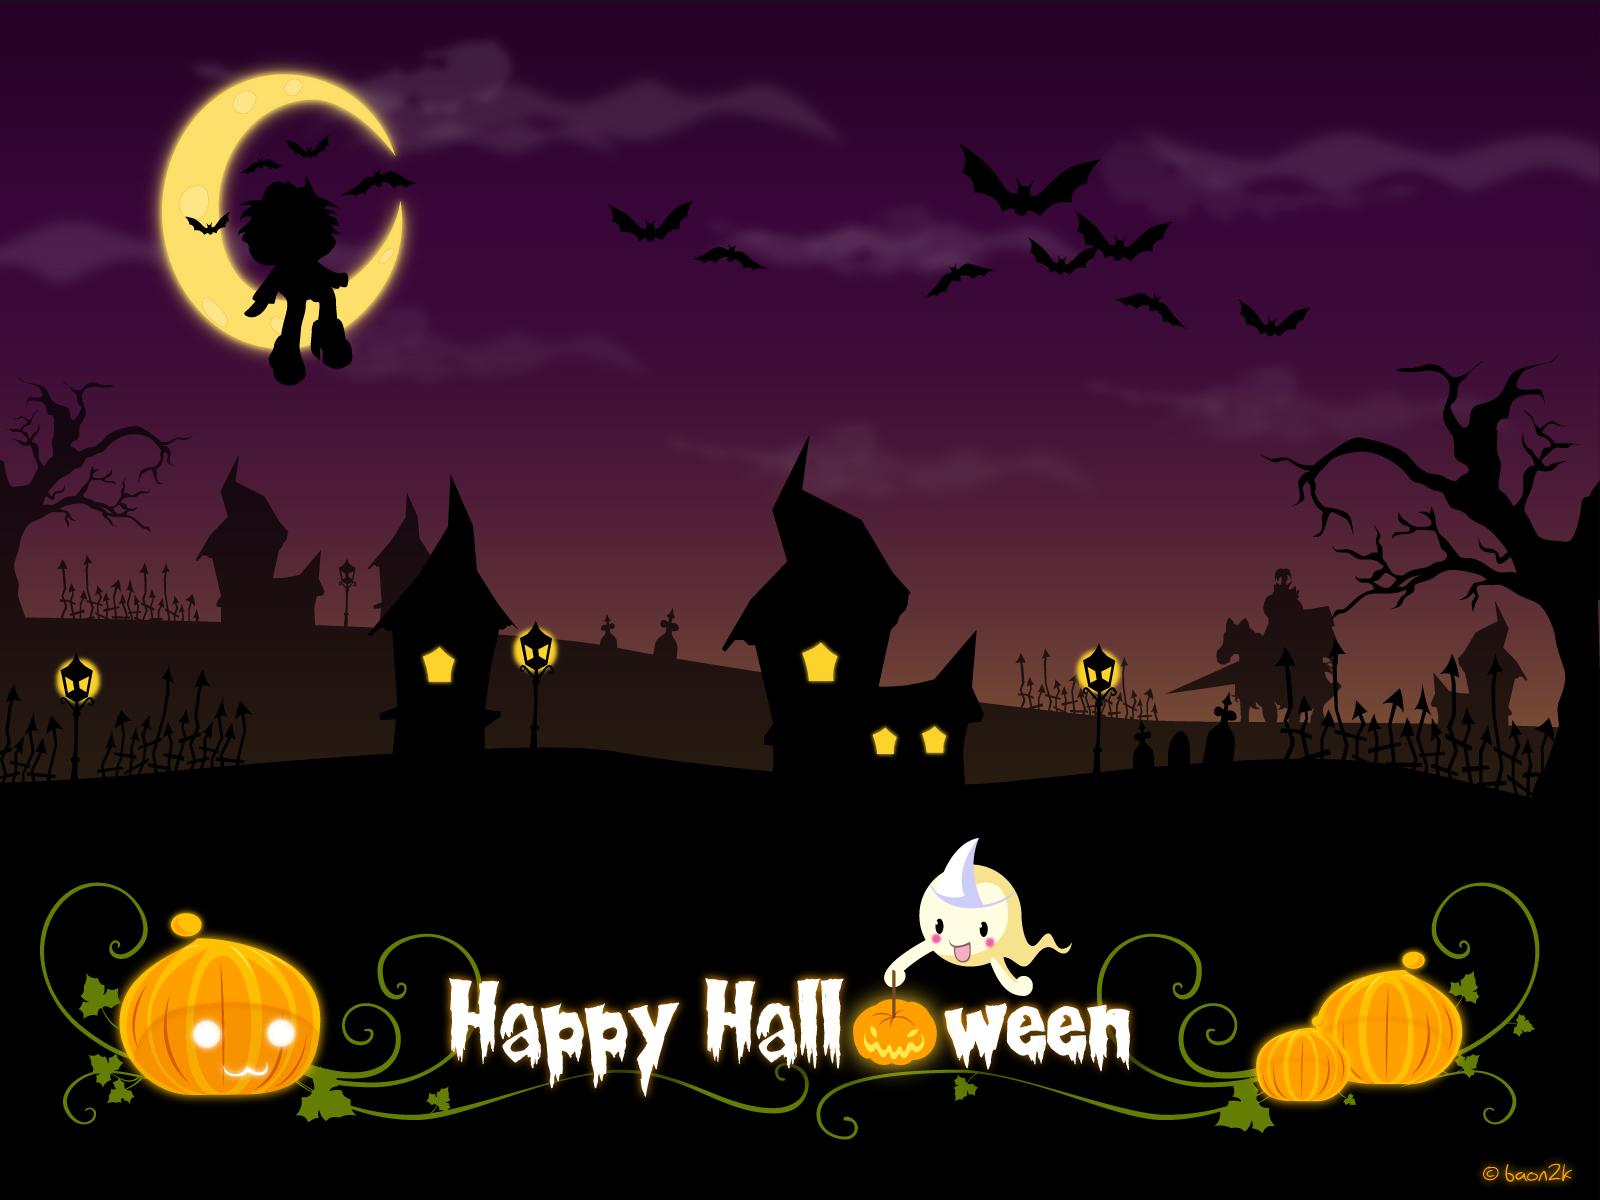 60 cute Halloween wallpapers HQ   DeepakC 1600x1200